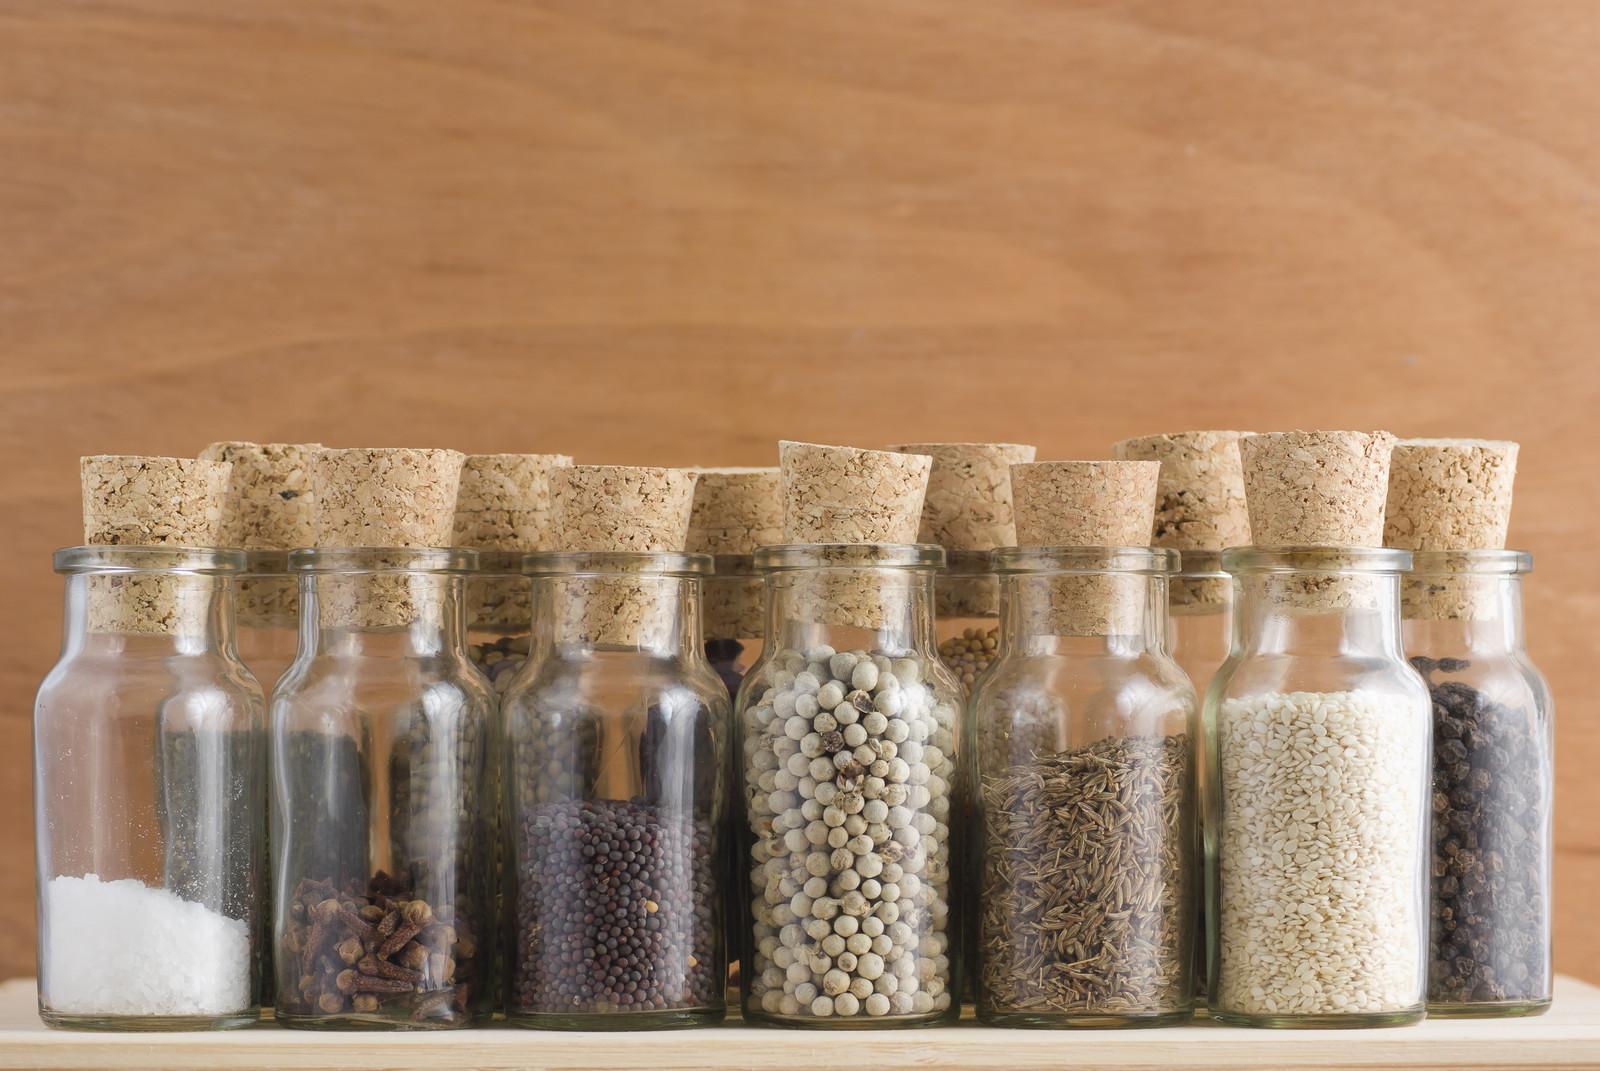 etiqueta tus tarros de cocina con pintura de pizarra